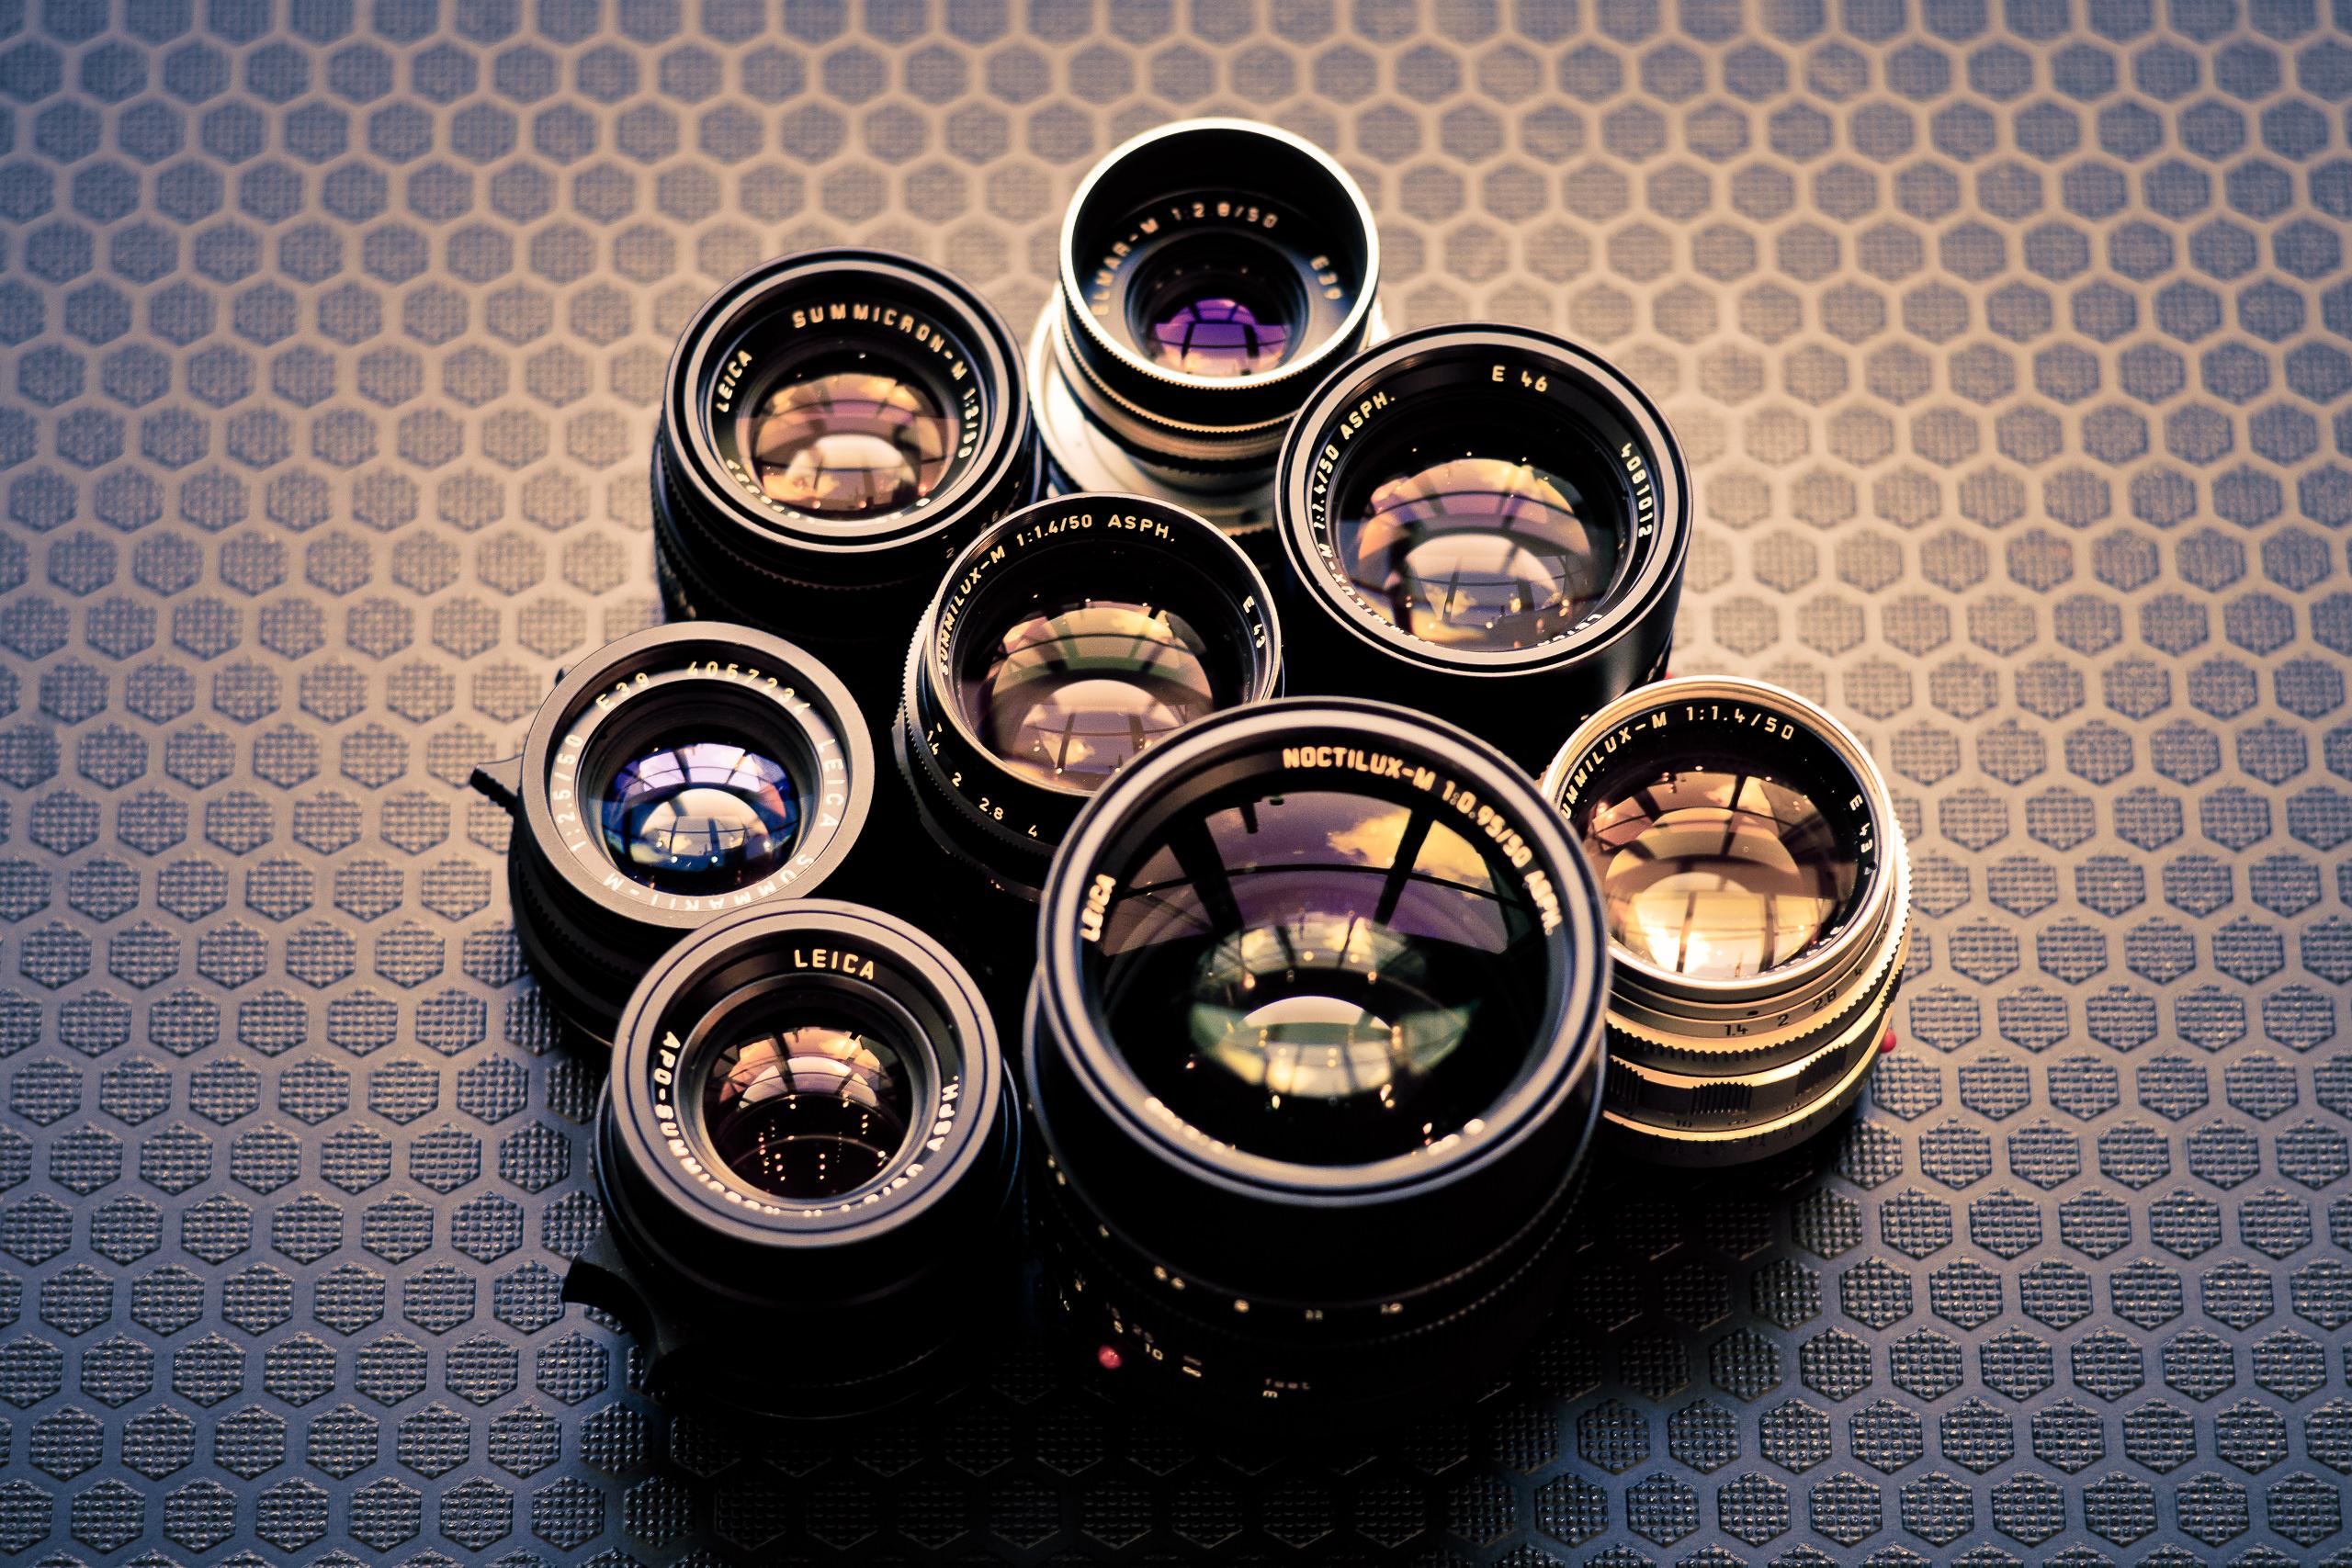 Workshop Portfolio 50Mm Lens Summicron Summilux Noctilux By Brett Leica Photographer